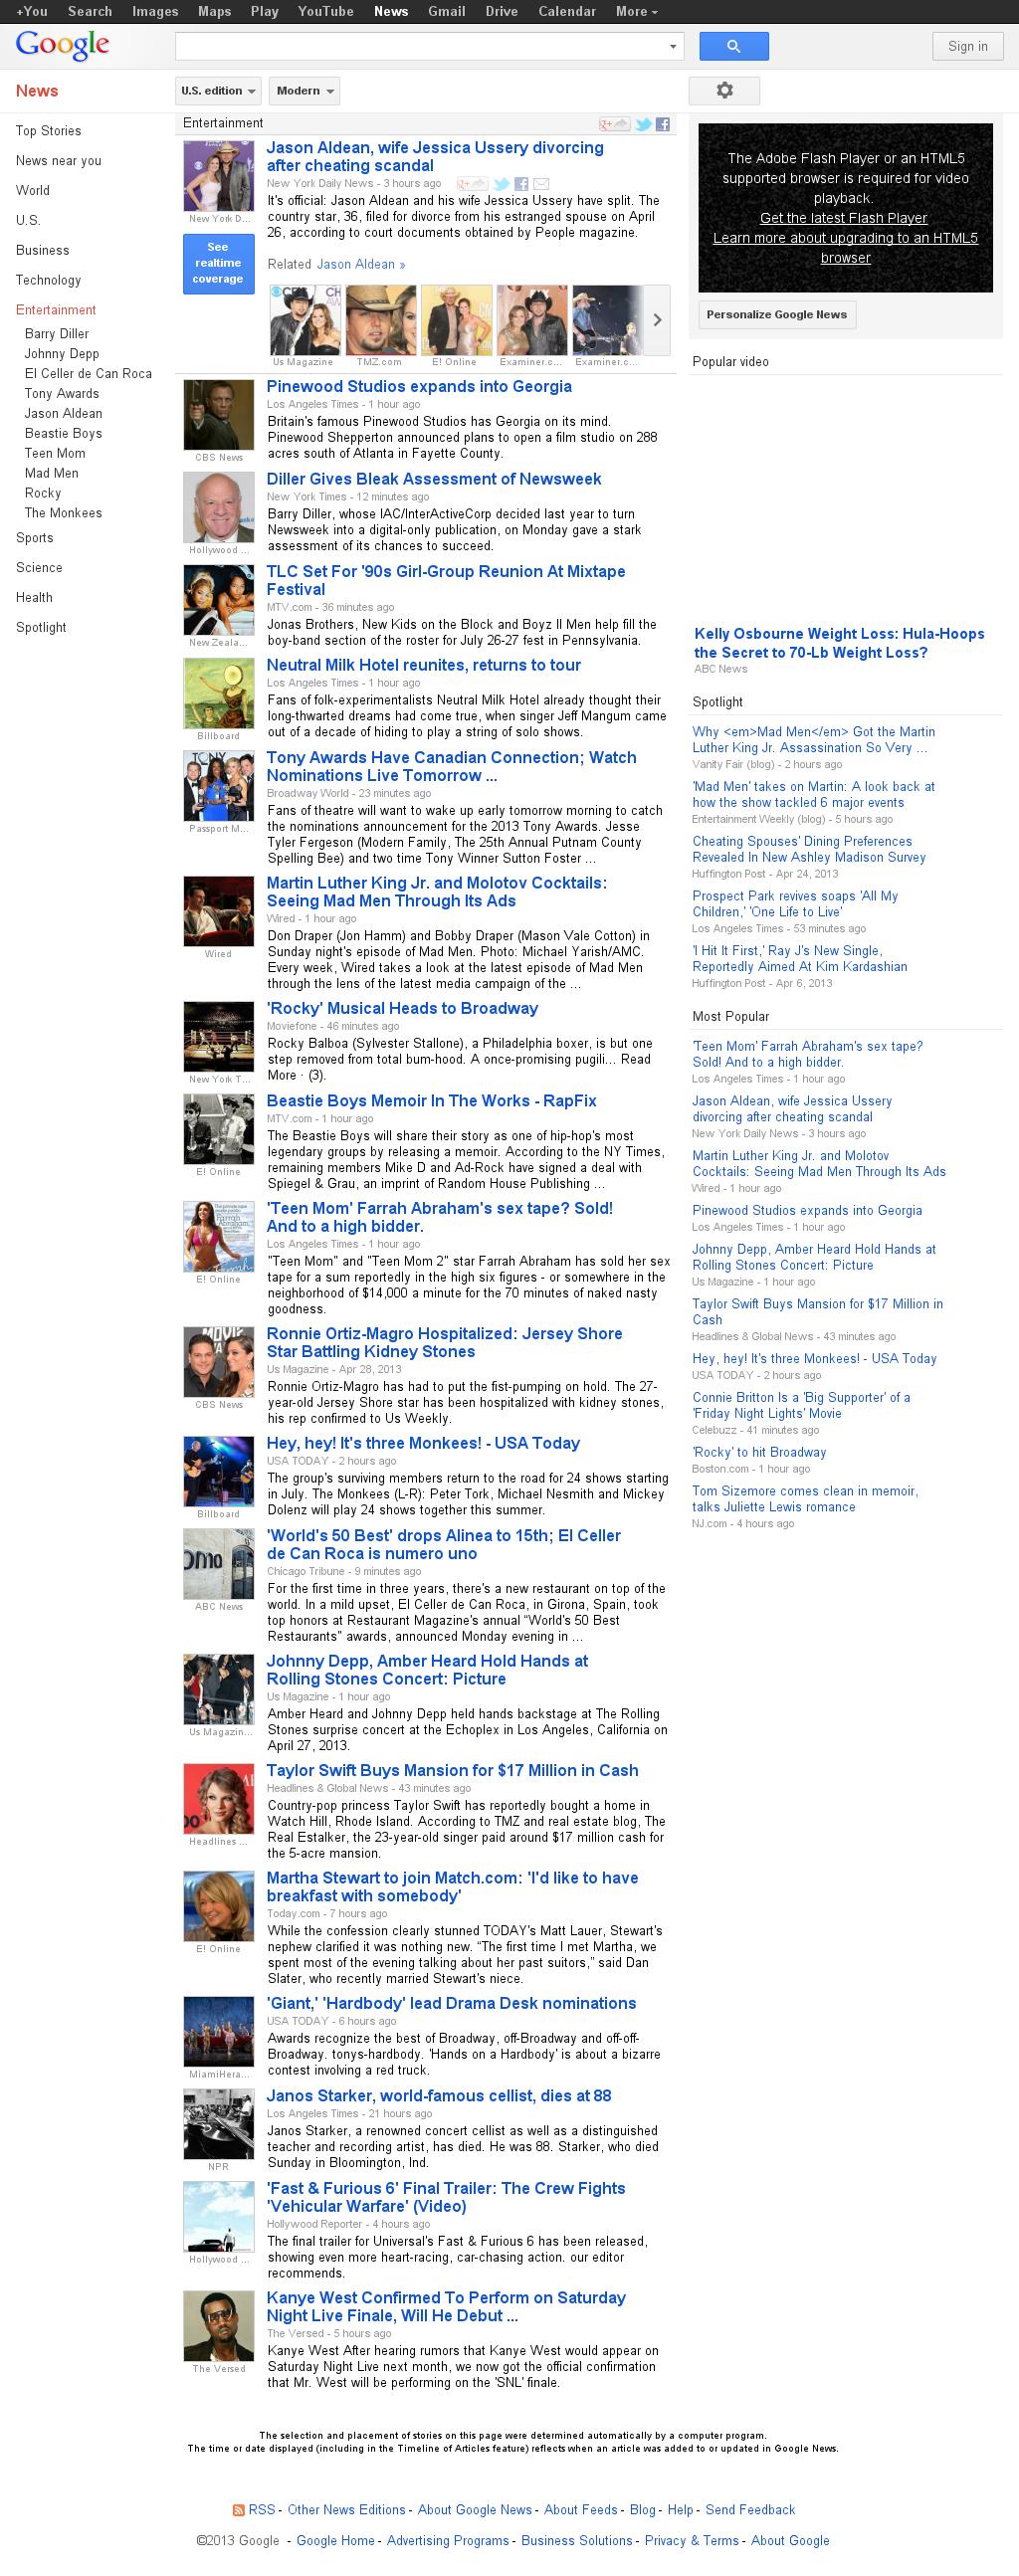 Google News: Entertainment at Monday April 29, 2013, 10:08 p.m. UTC